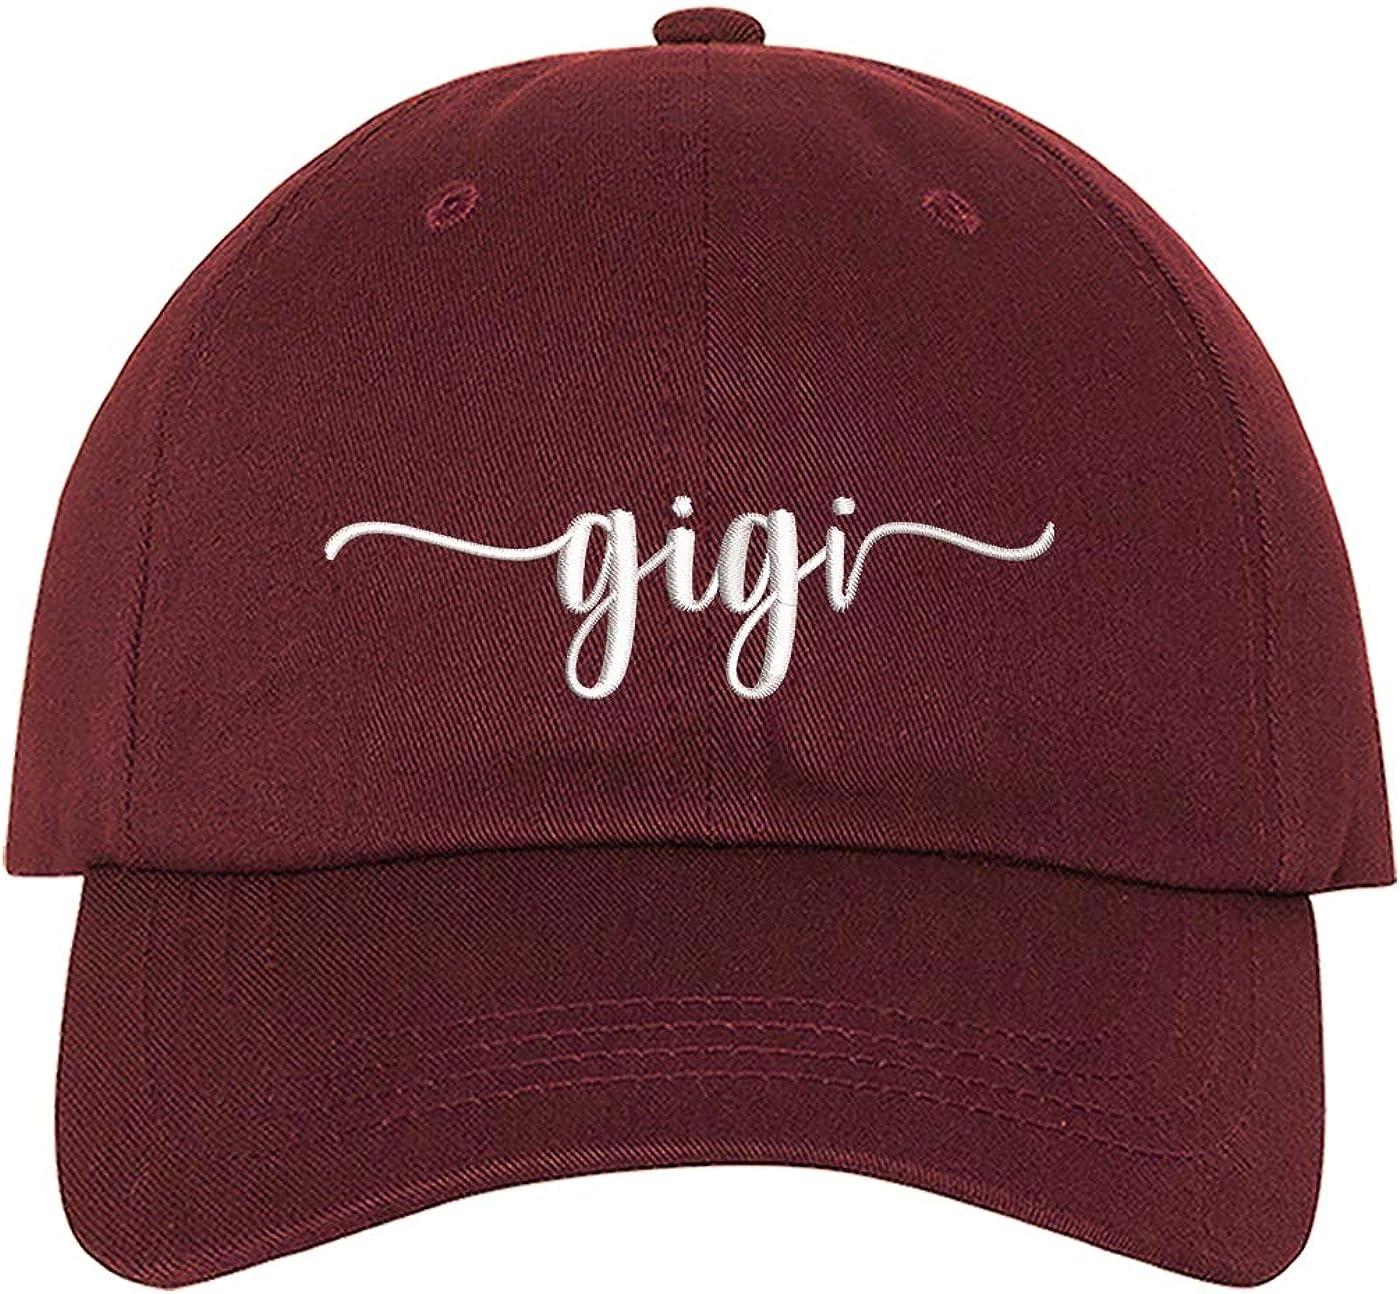 DSY Lifestyle Gigi Embroidered Unisex Baseball Hat - Gigi Dad Hat